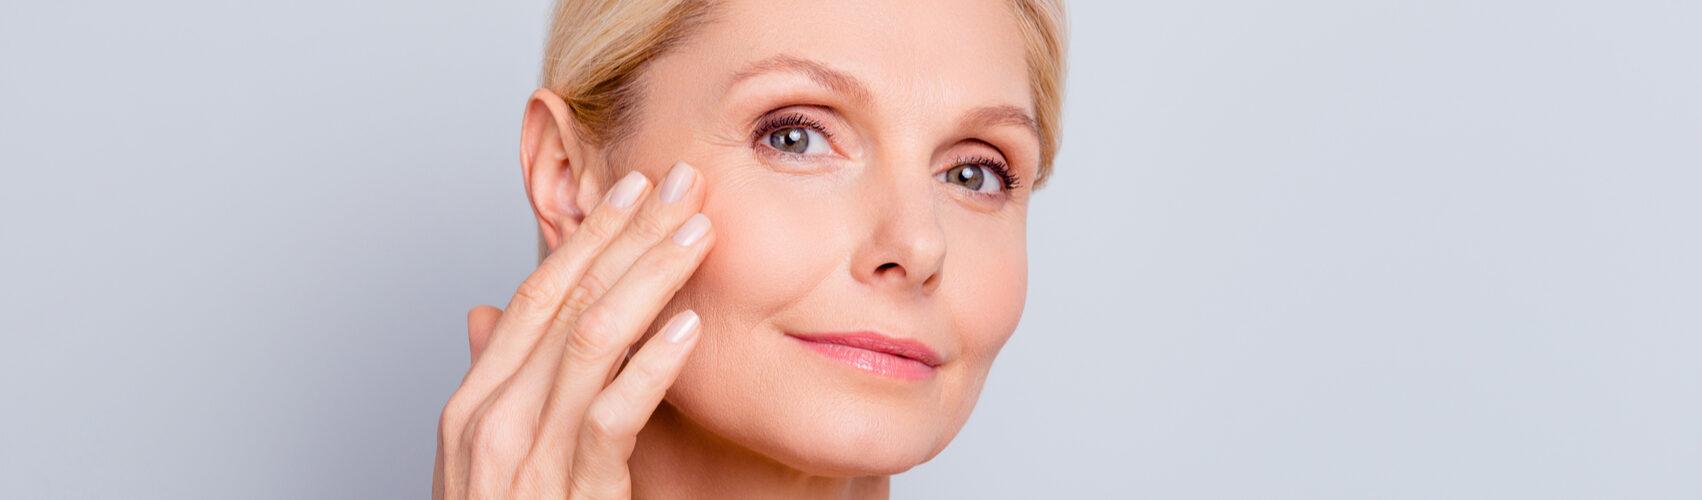 Anti-Aging Creams: Staff Picks